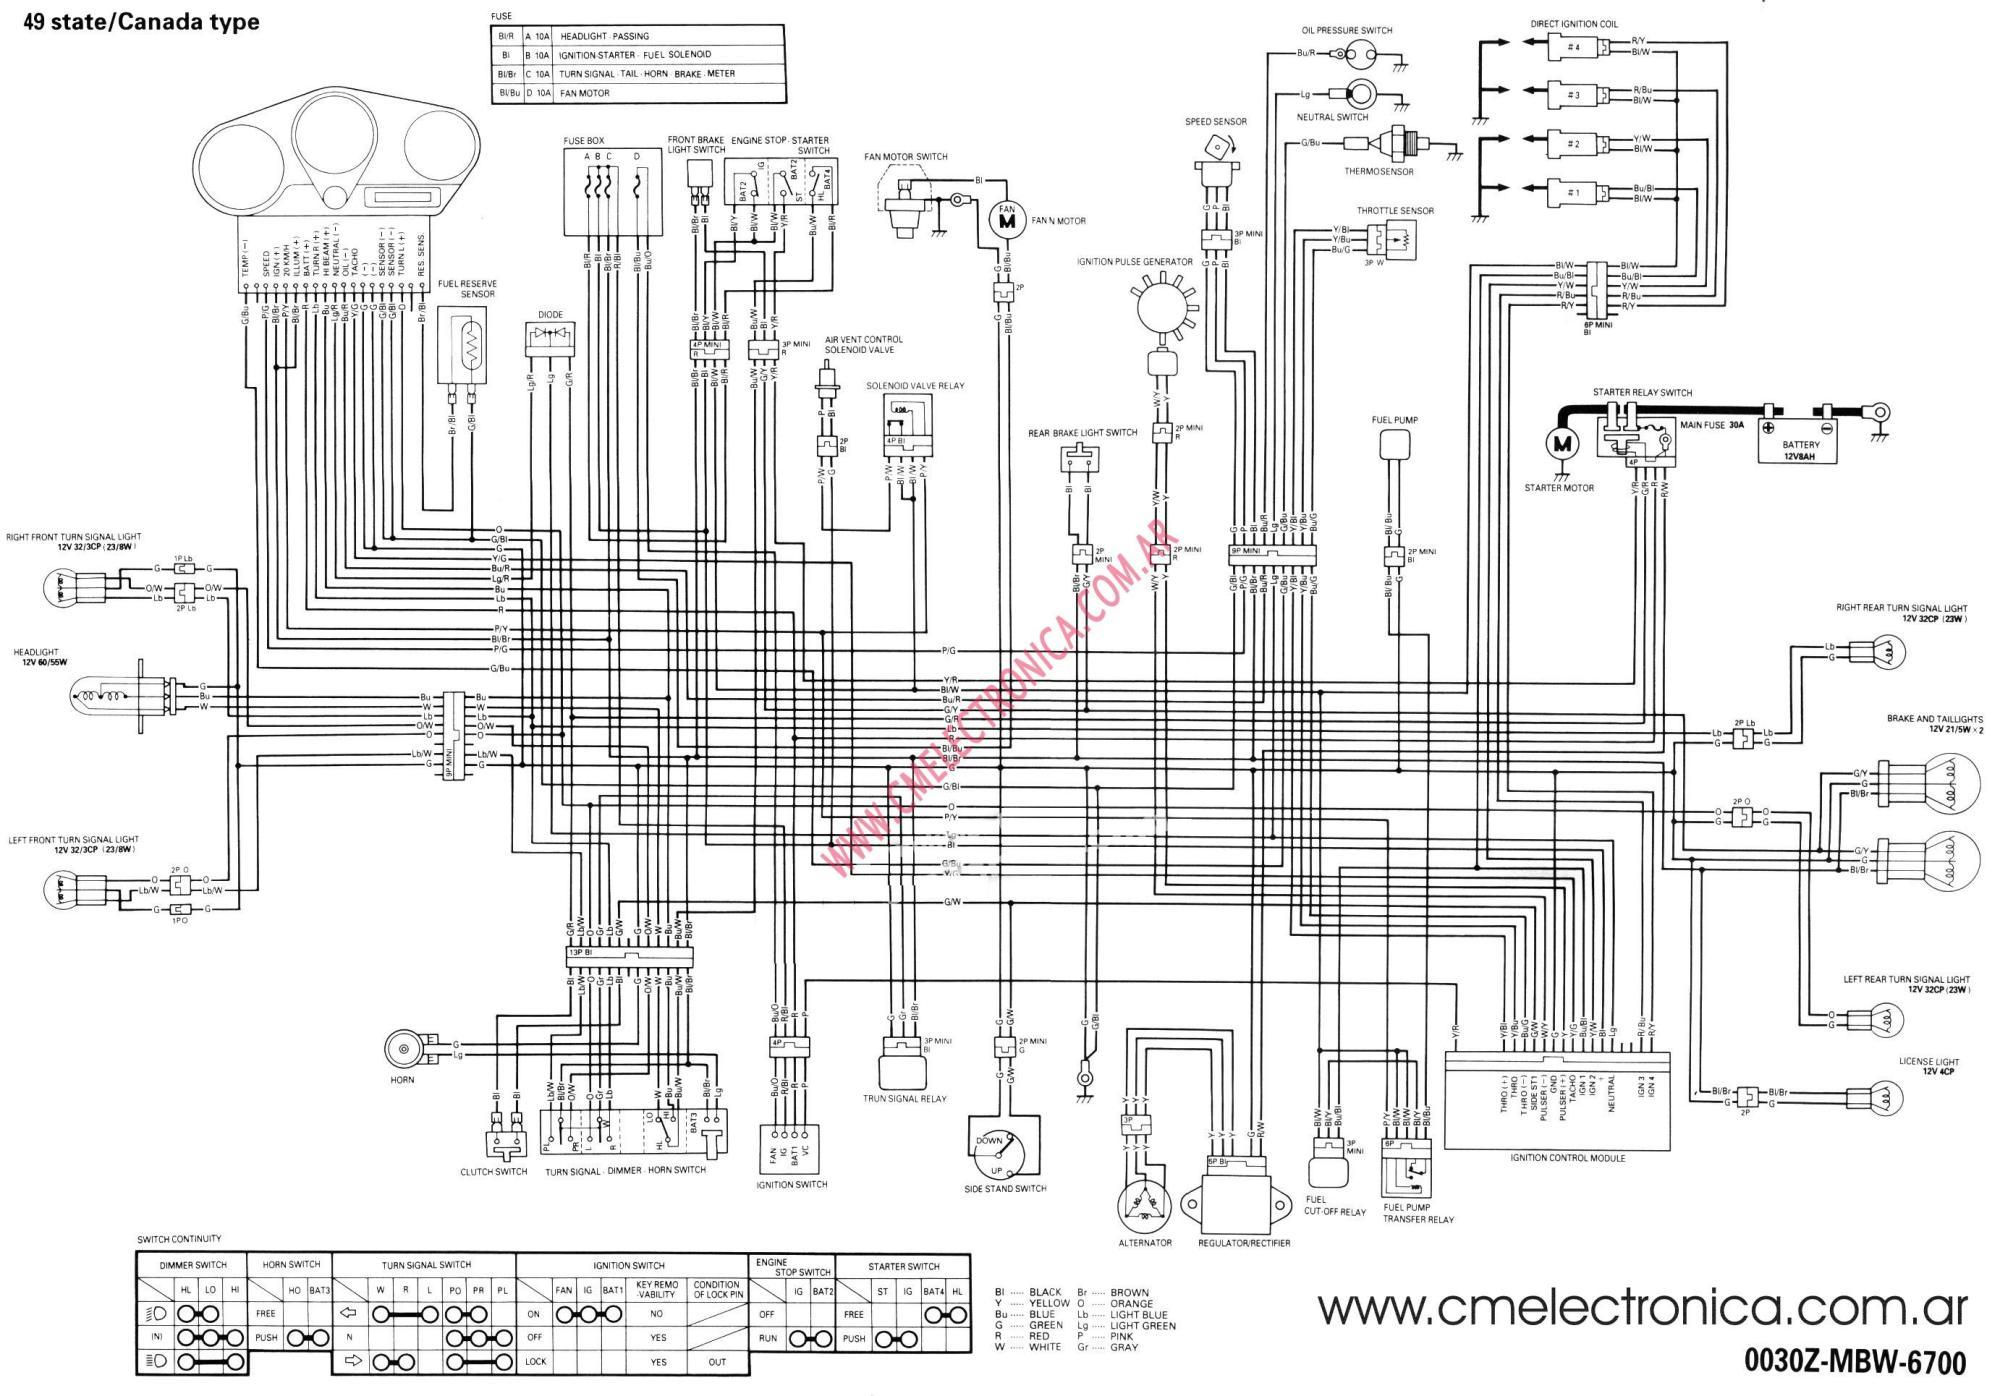 hight resolution of 01 sea doo gtx wiring diagram wiring diagram93 sea doo wiring diagram wiring diagram01 sea doo